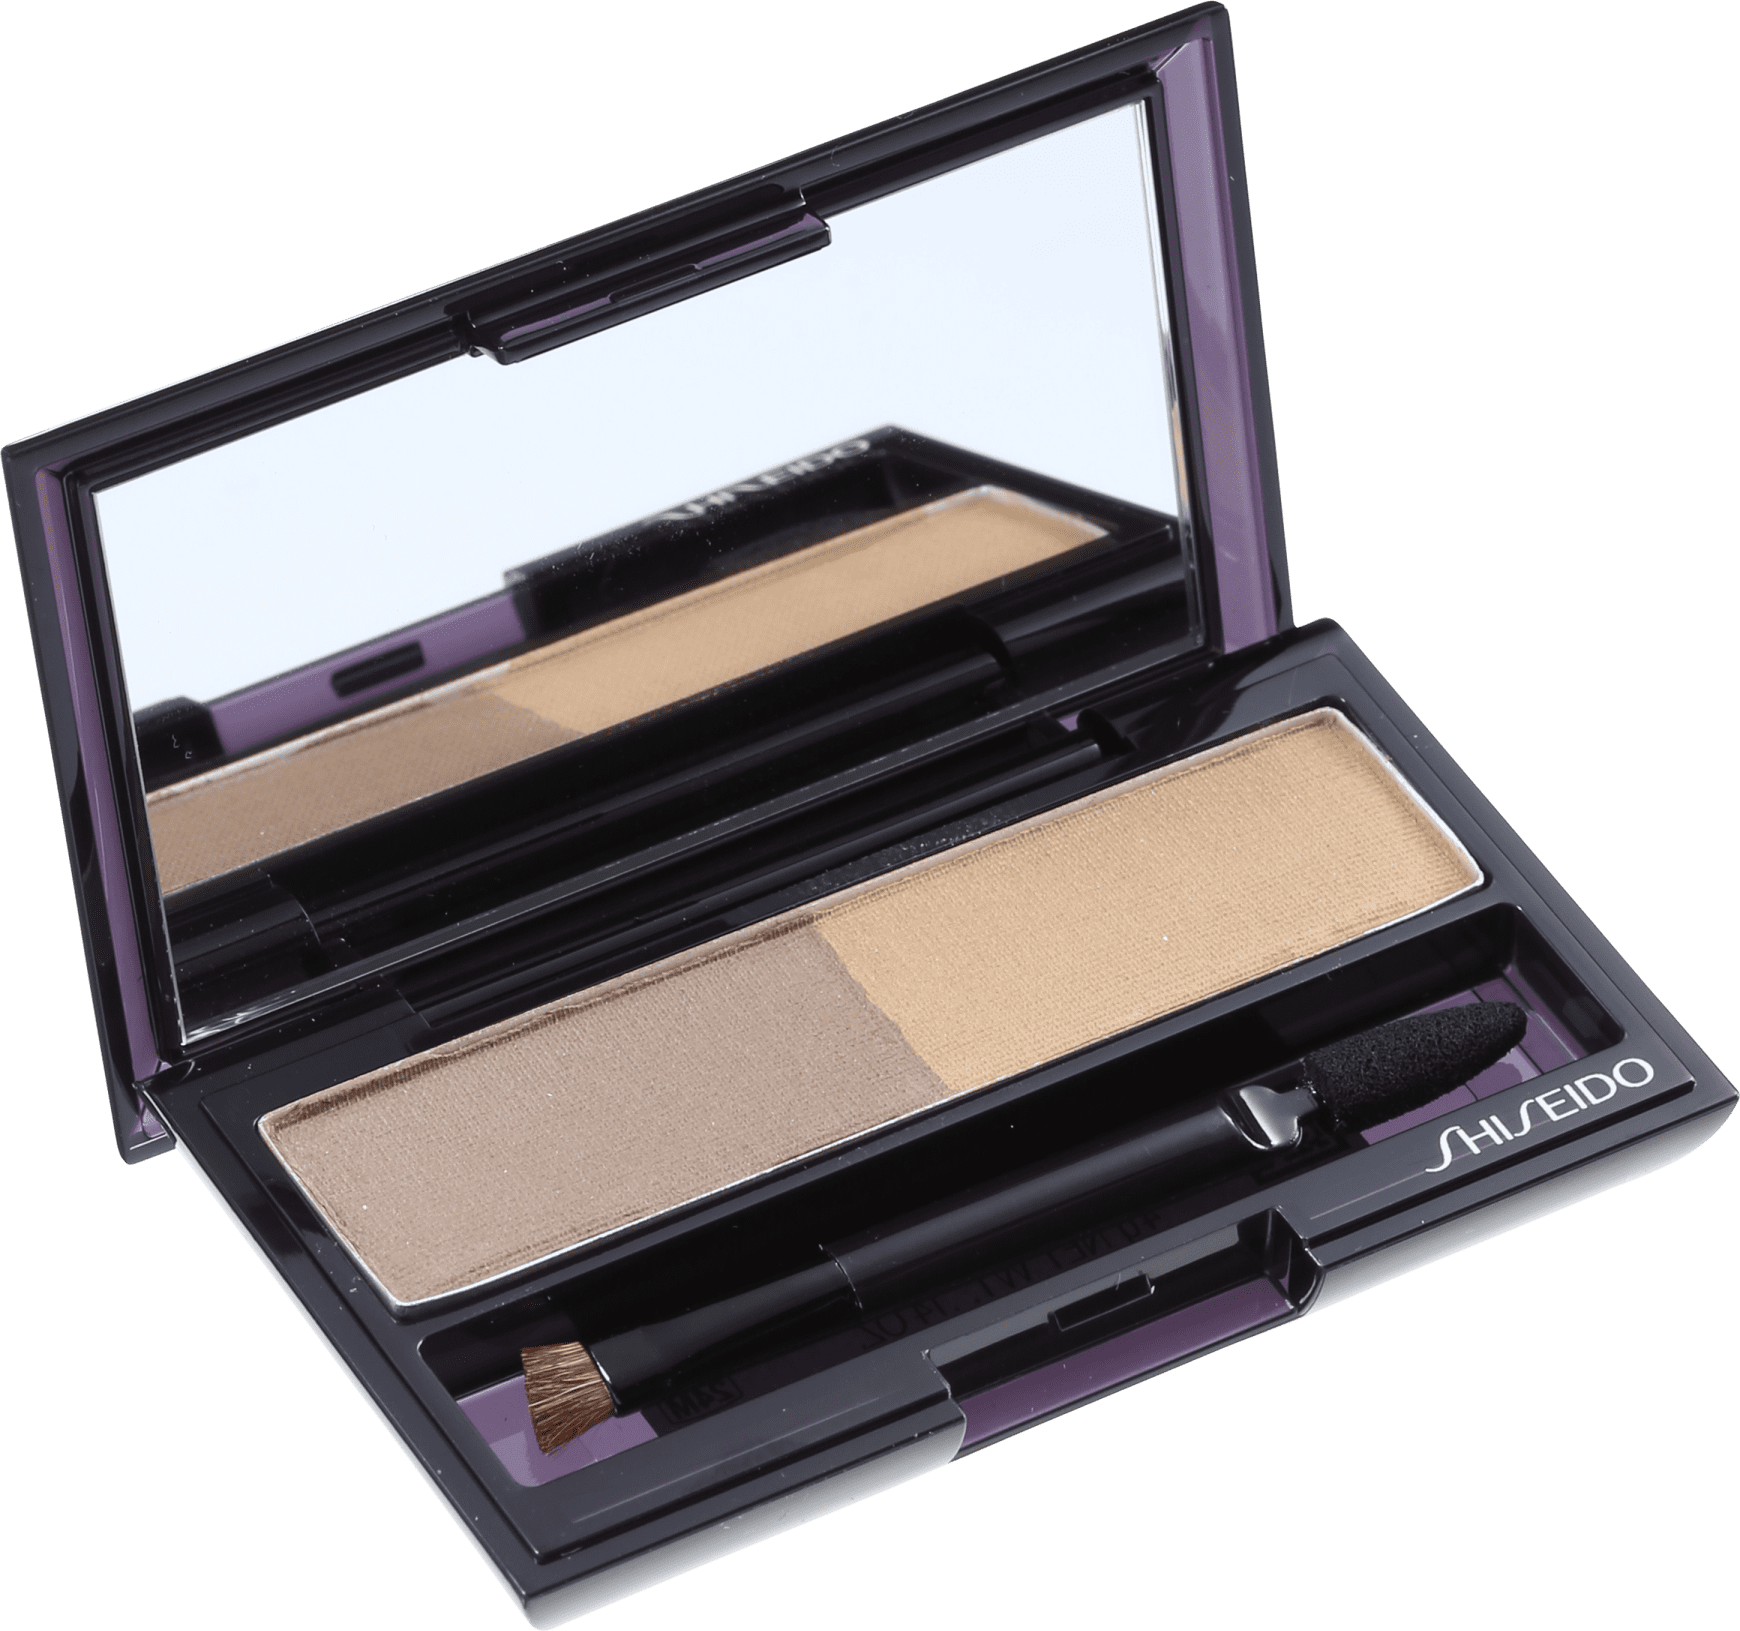 paleta shiseido eyebrow styling compact beleza na web. Black Bedroom Furniture Sets. Home Design Ideas